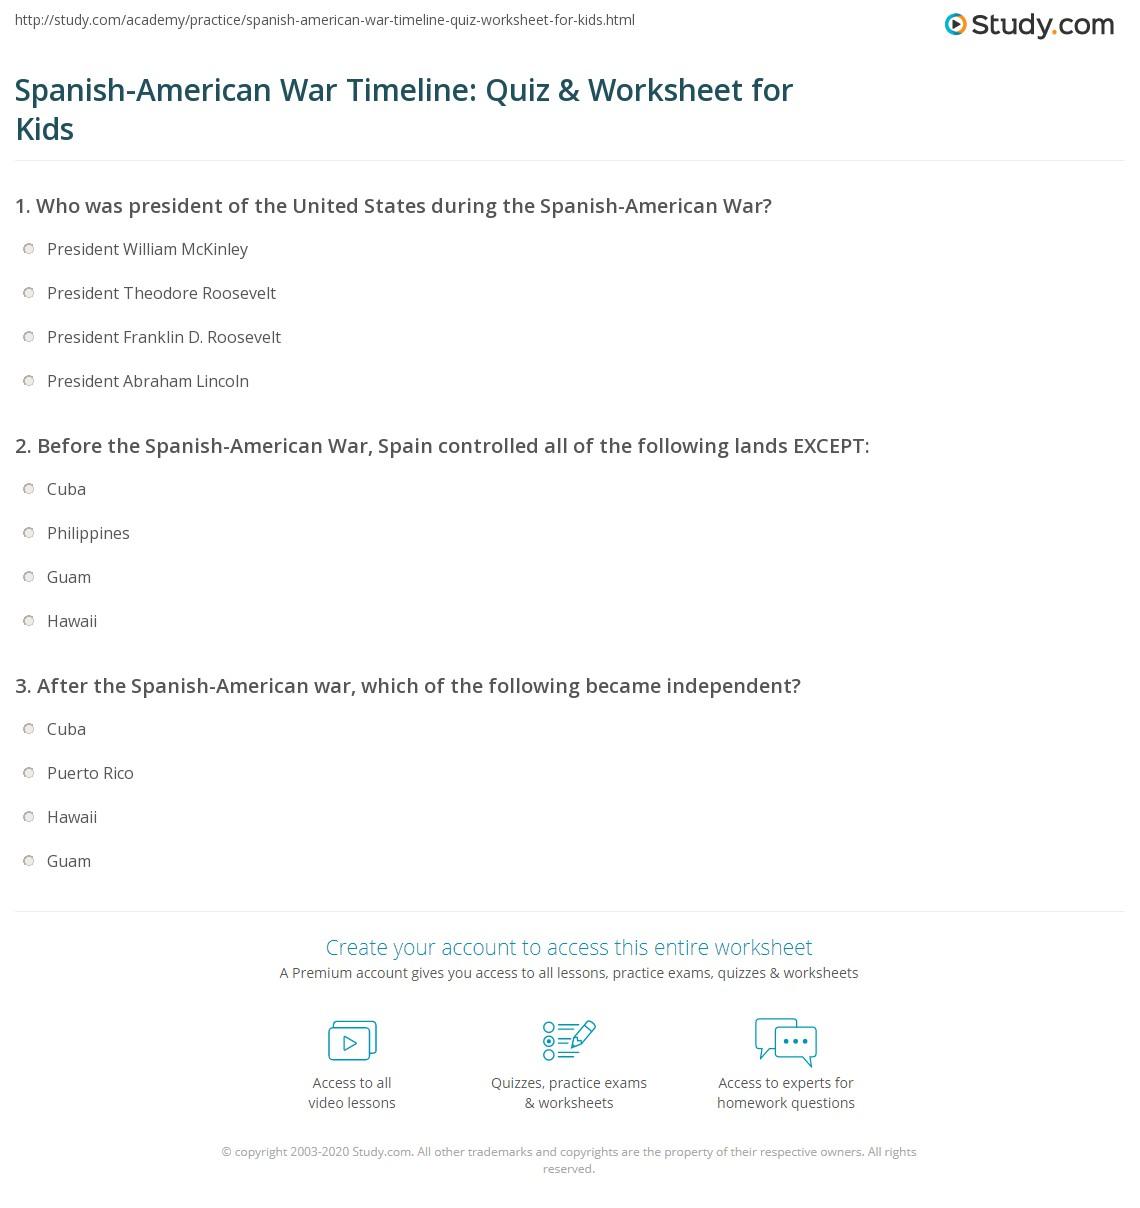 worksheet Spanish American War Worksheet spanish american war timeline quiz worksheet for kids study com print lesson worksheet